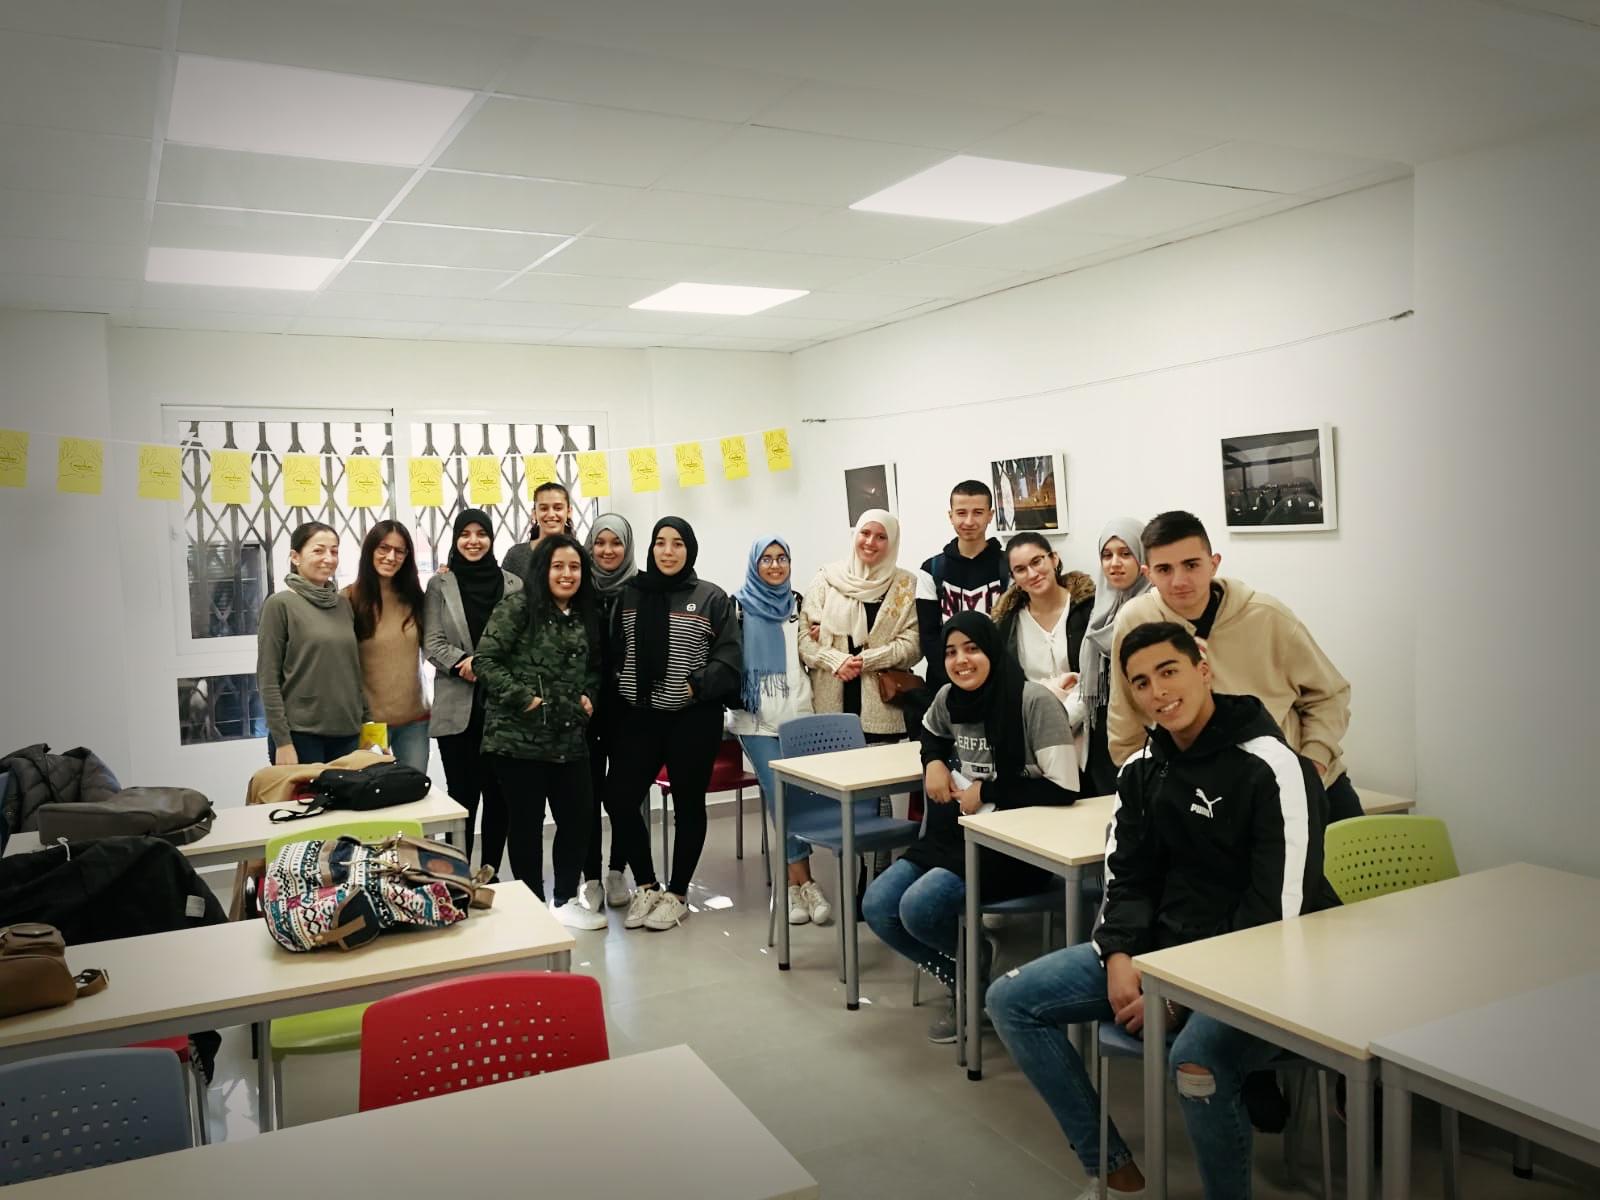 Exposición: Concurso internacional de fotografía Alliance Française en España y EFTI 11